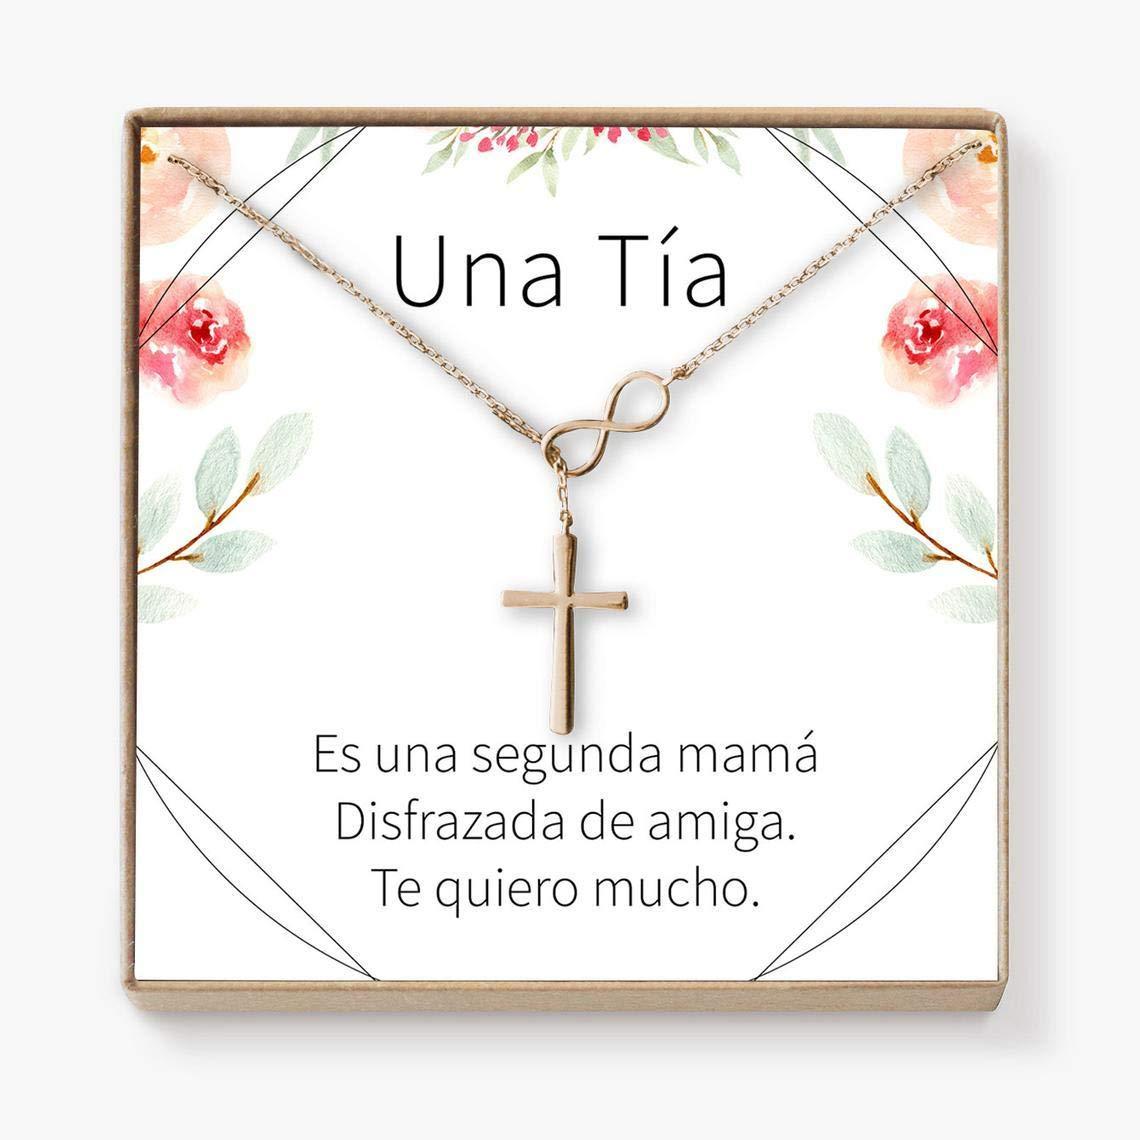 Amazon.com: xatify Collar Regalo para Tía: Joyería para Tía ...